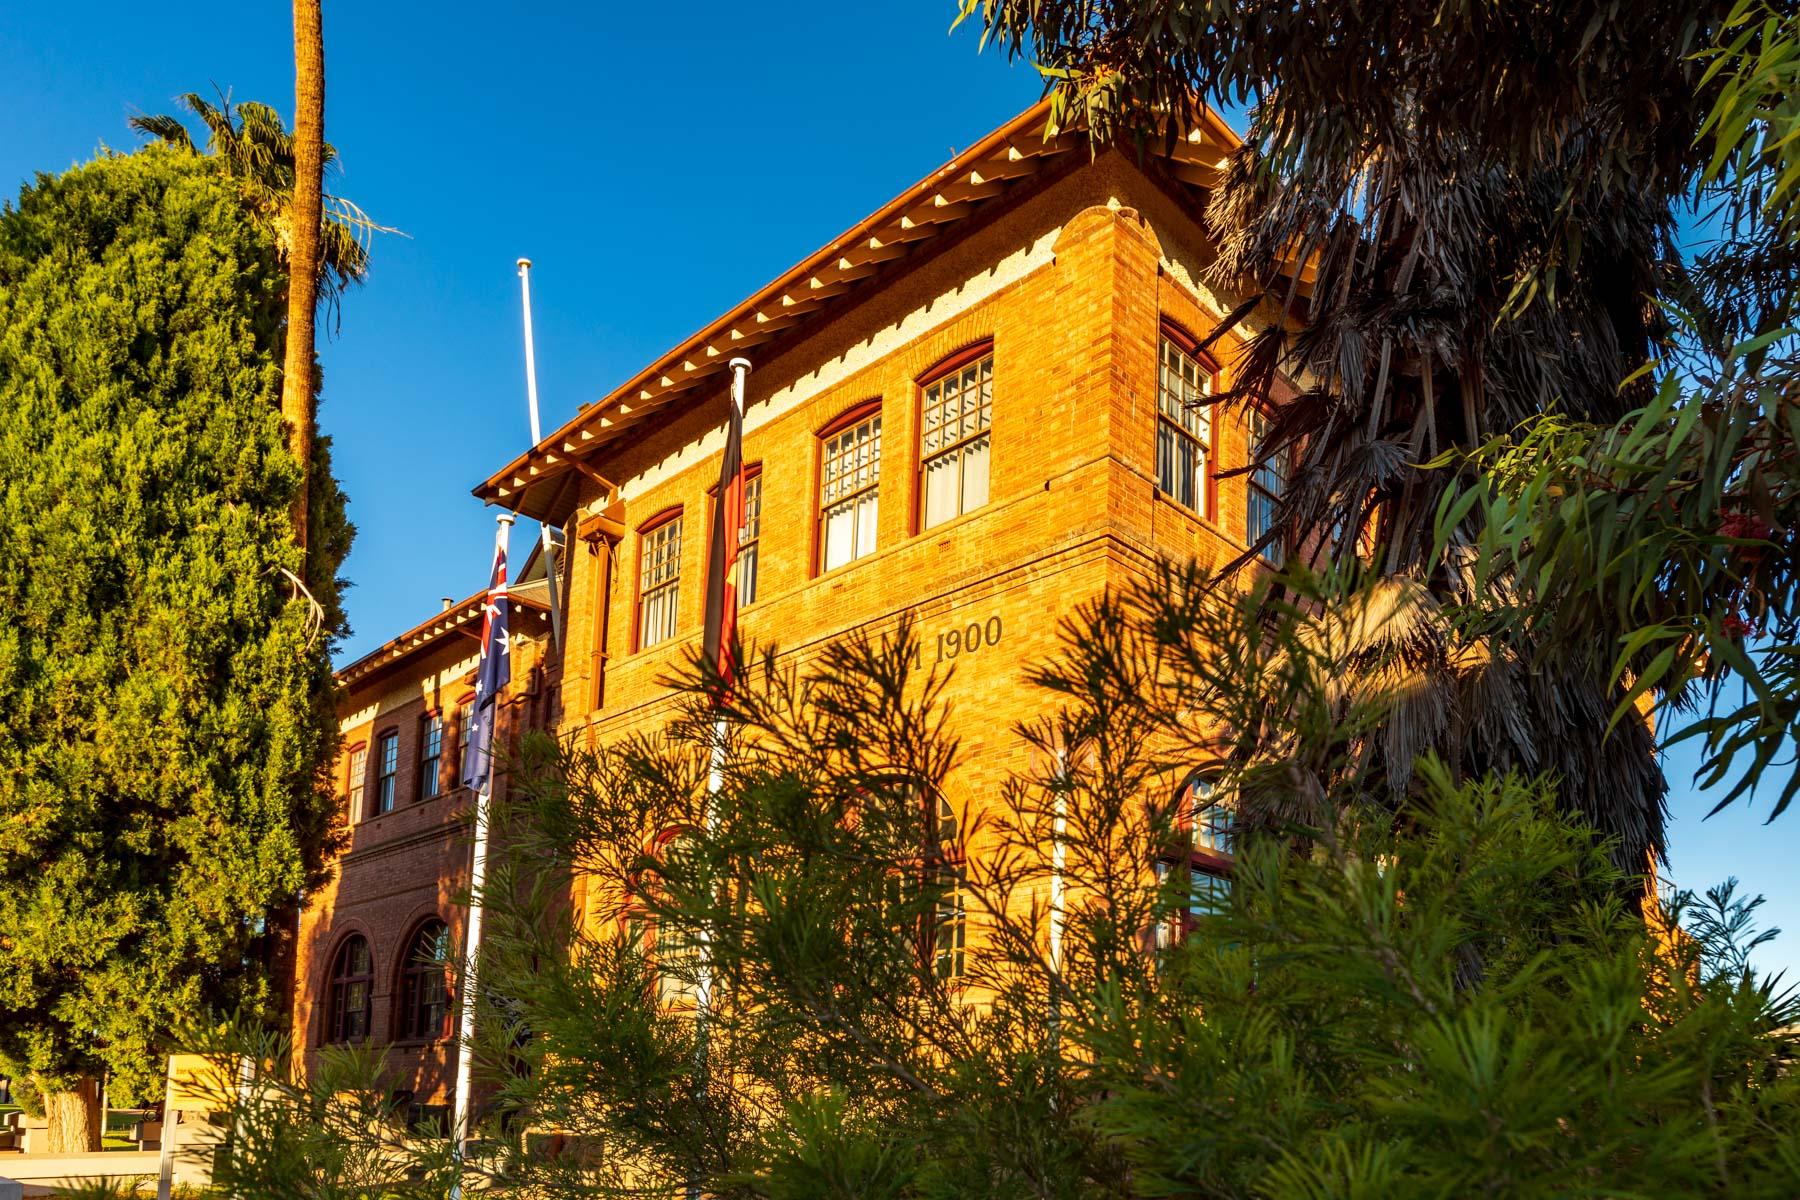 Technical College and Museum Broken Hill, Australia